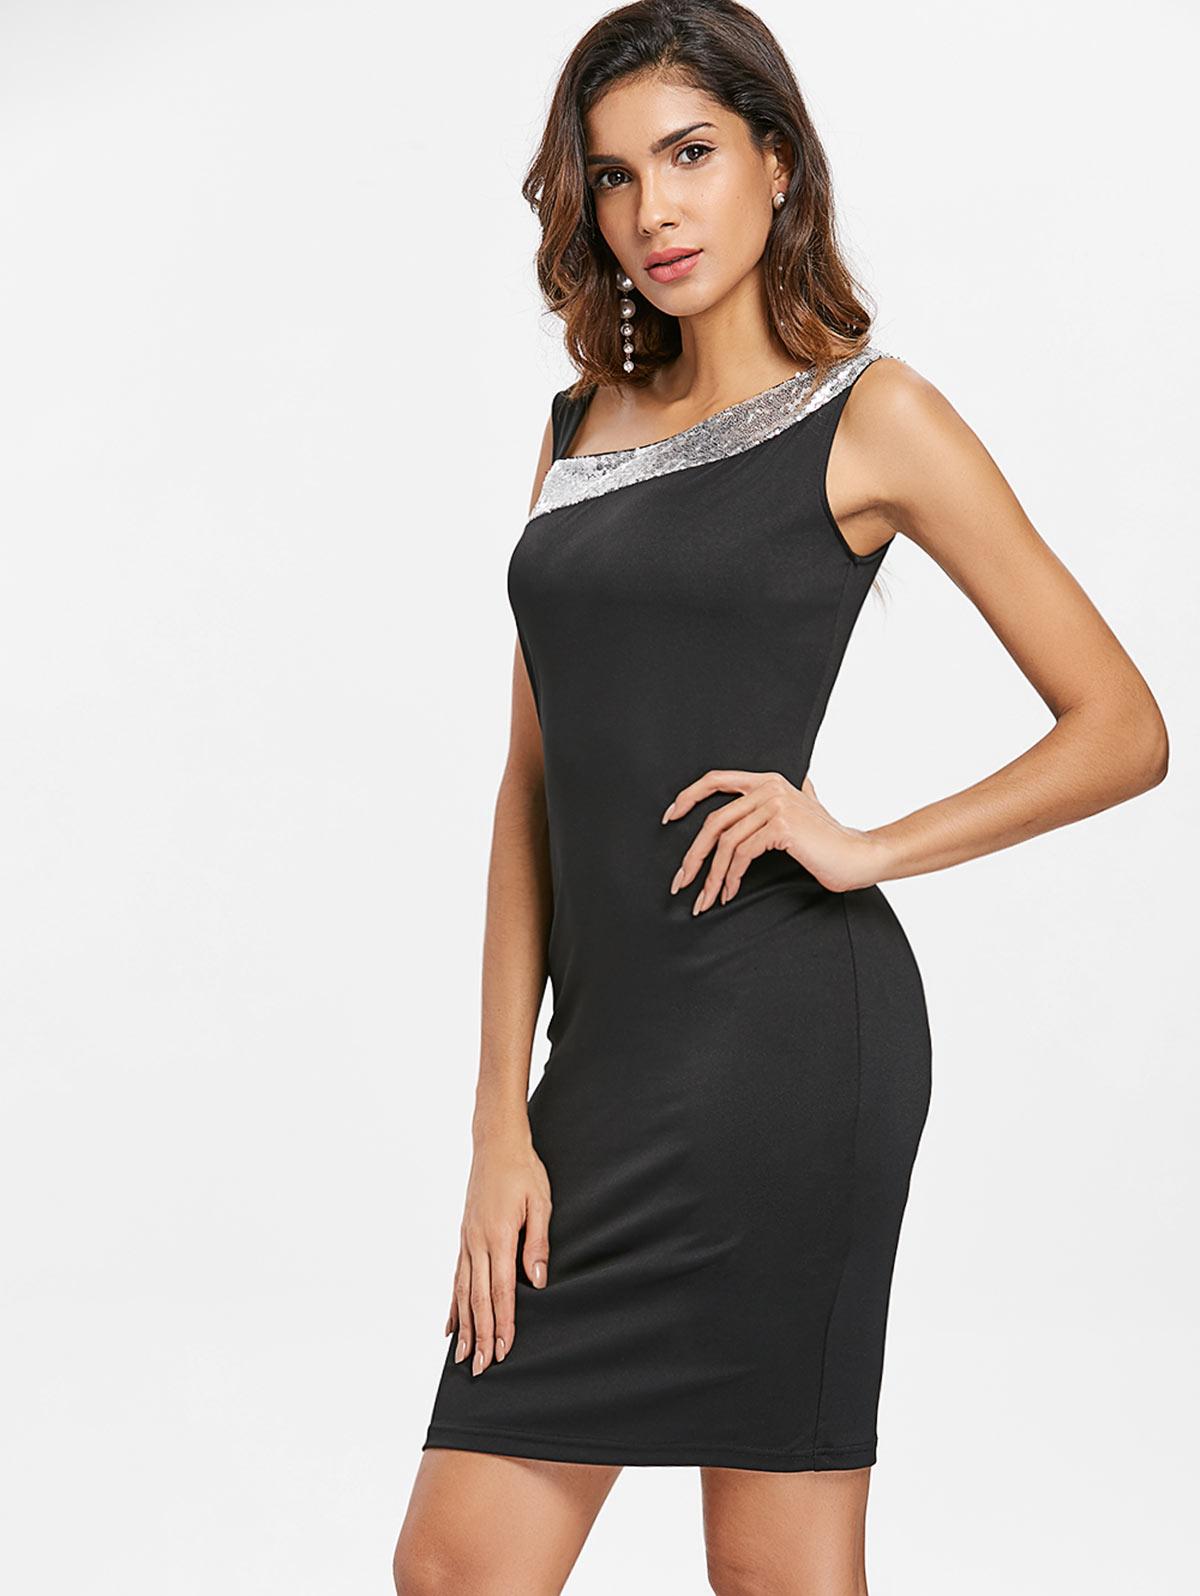 666c18a185cb5 VESTLINDA Skew Neck Sequin Bodycon Dress Black Mini Party Dress Women  Vestidos Verano 2018 Sleeveless Sheath Slim Elegant Dress